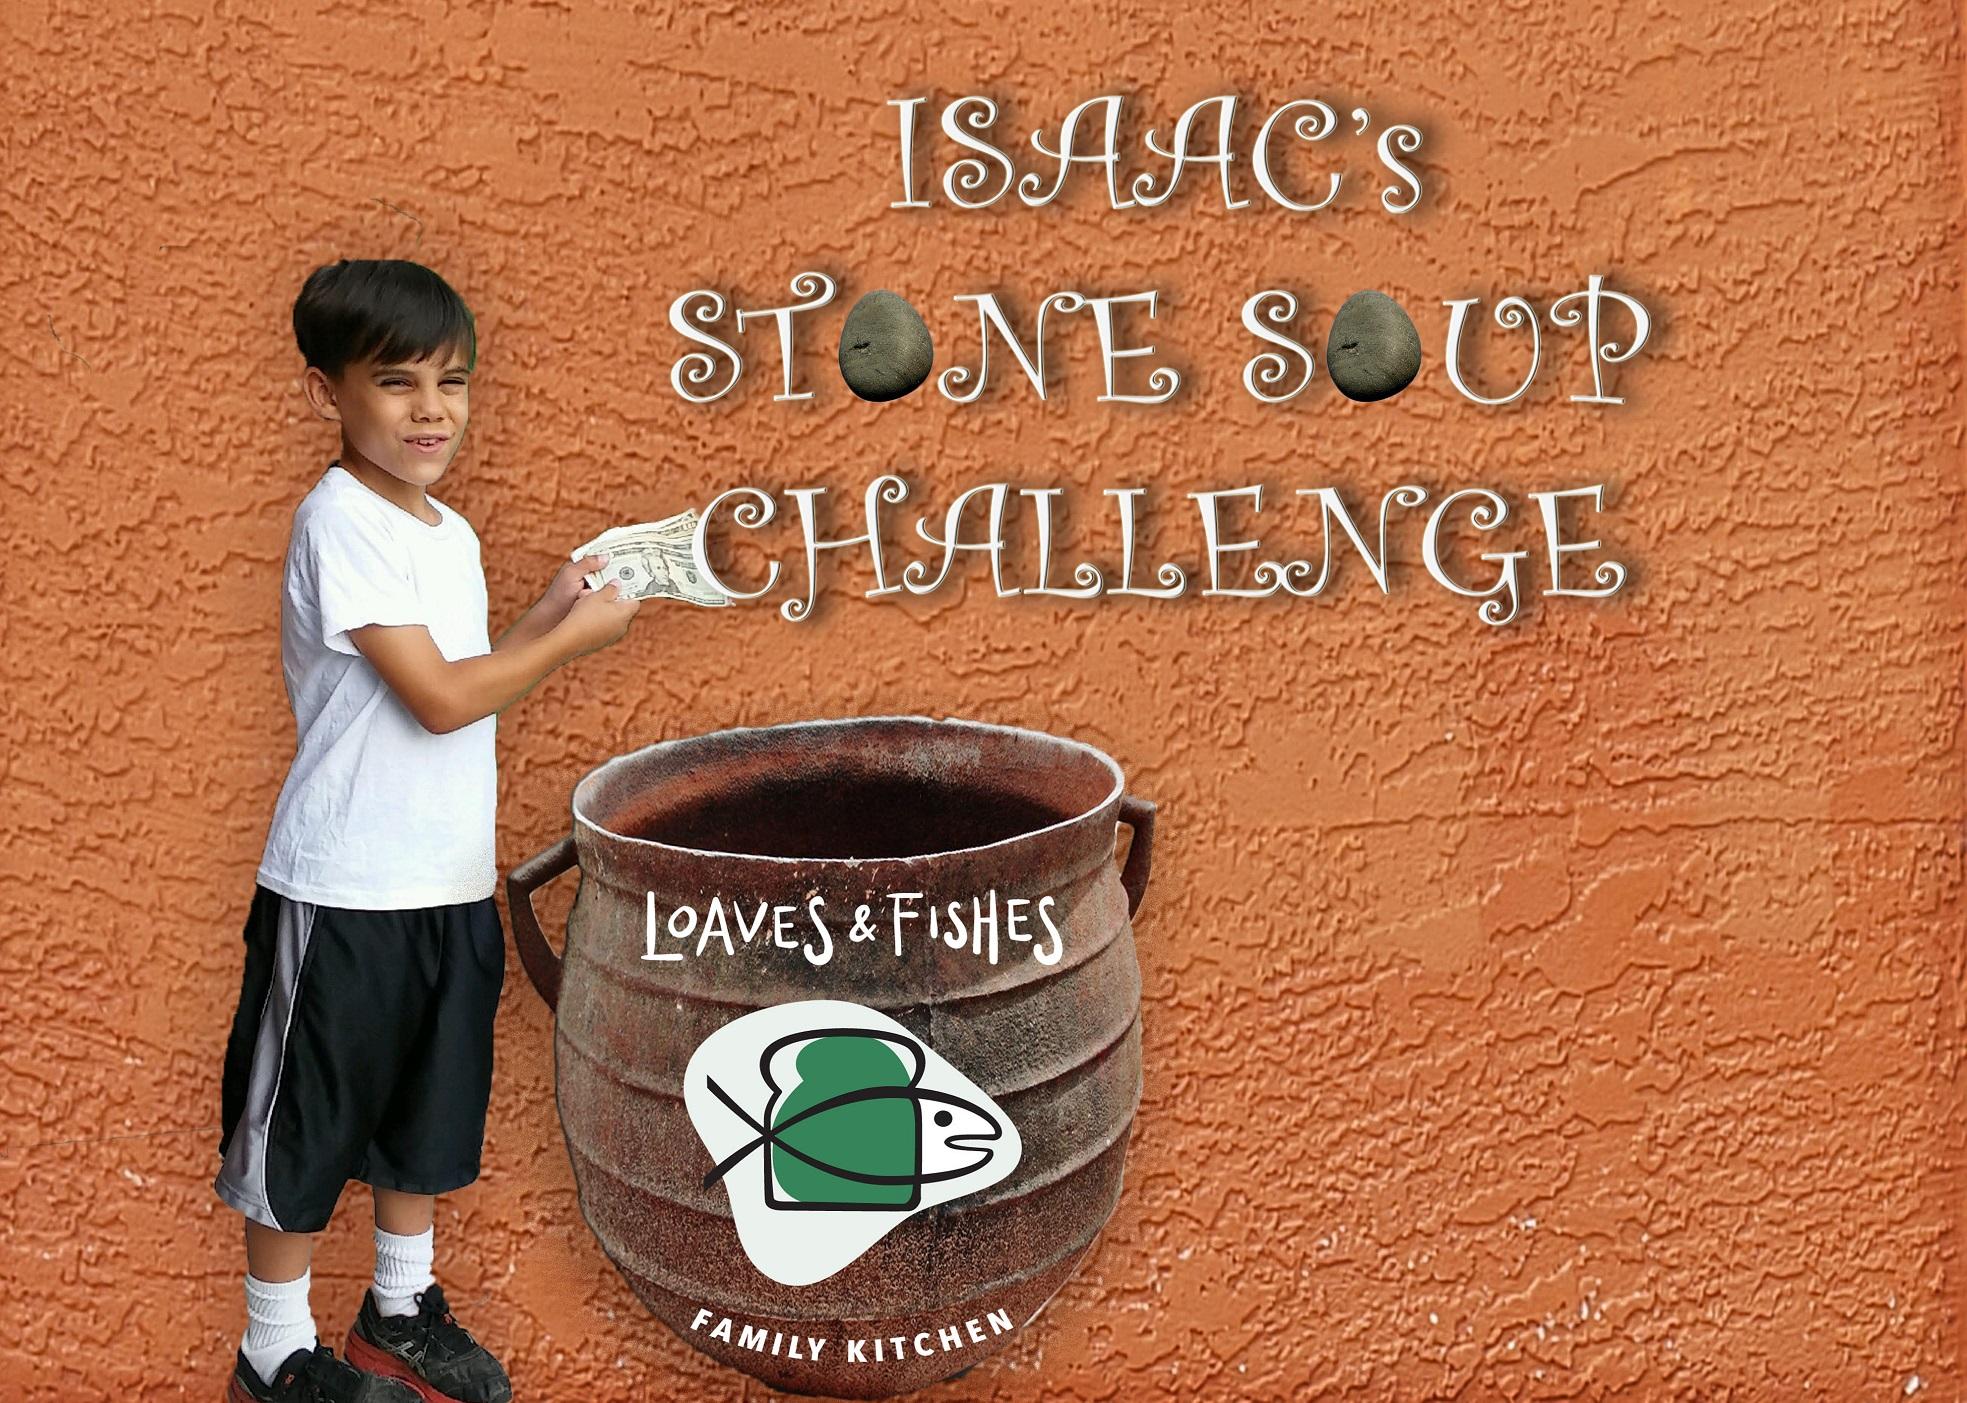 Isaac-Stone-Soup-Challenge-copy.jpg